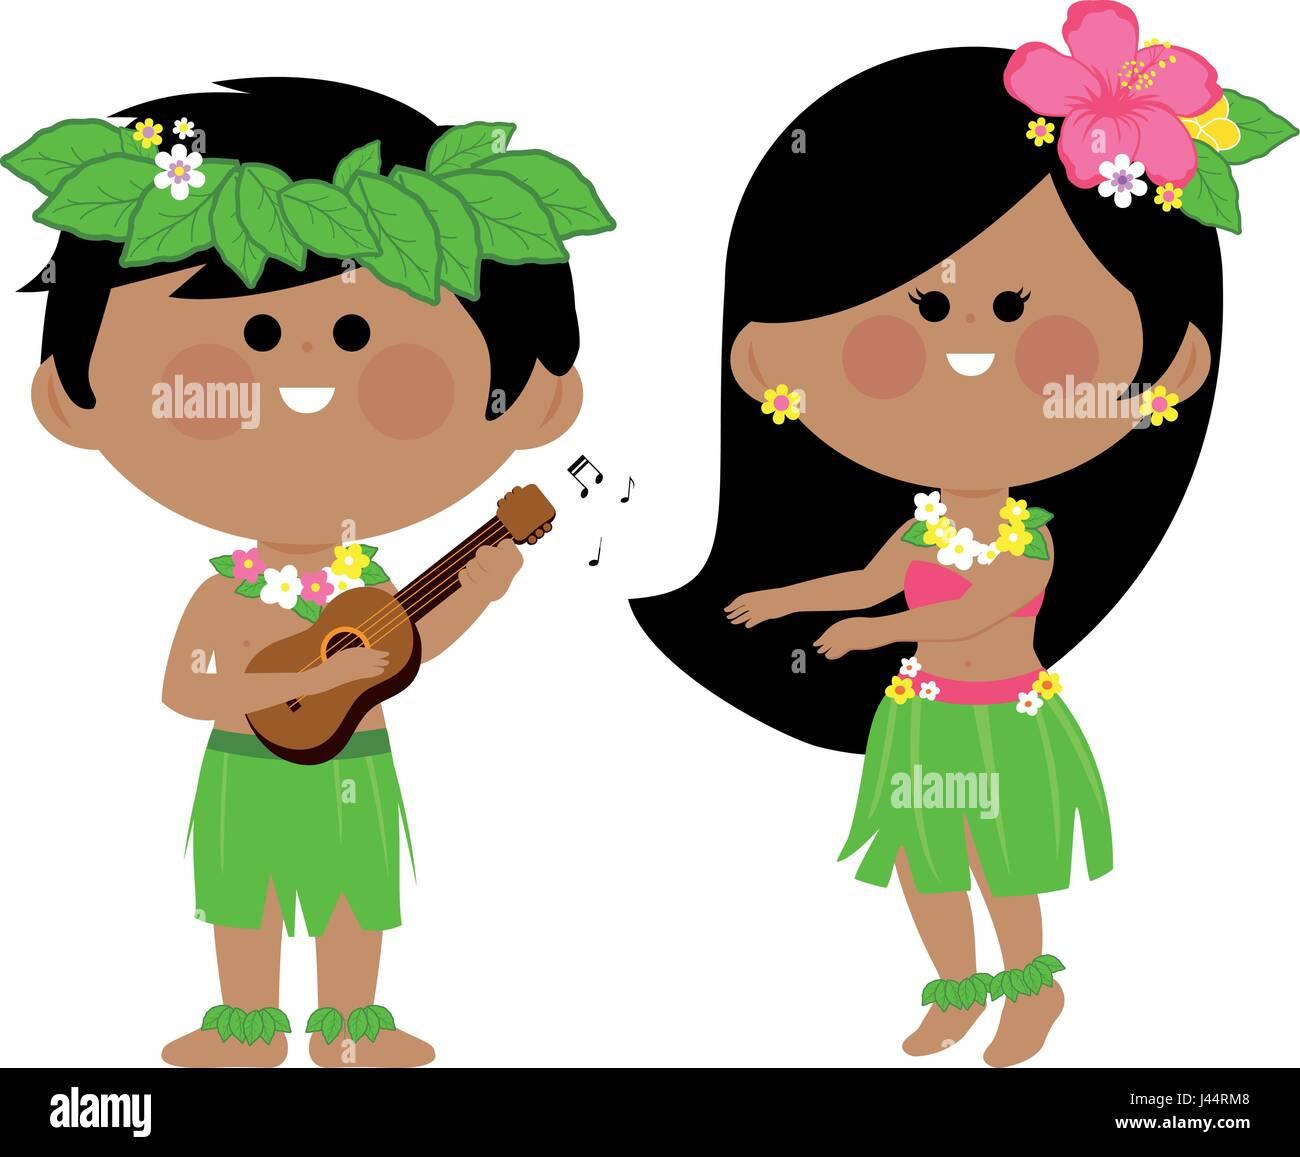 Hawaiian children playing music and hula dancing - Stock Vector